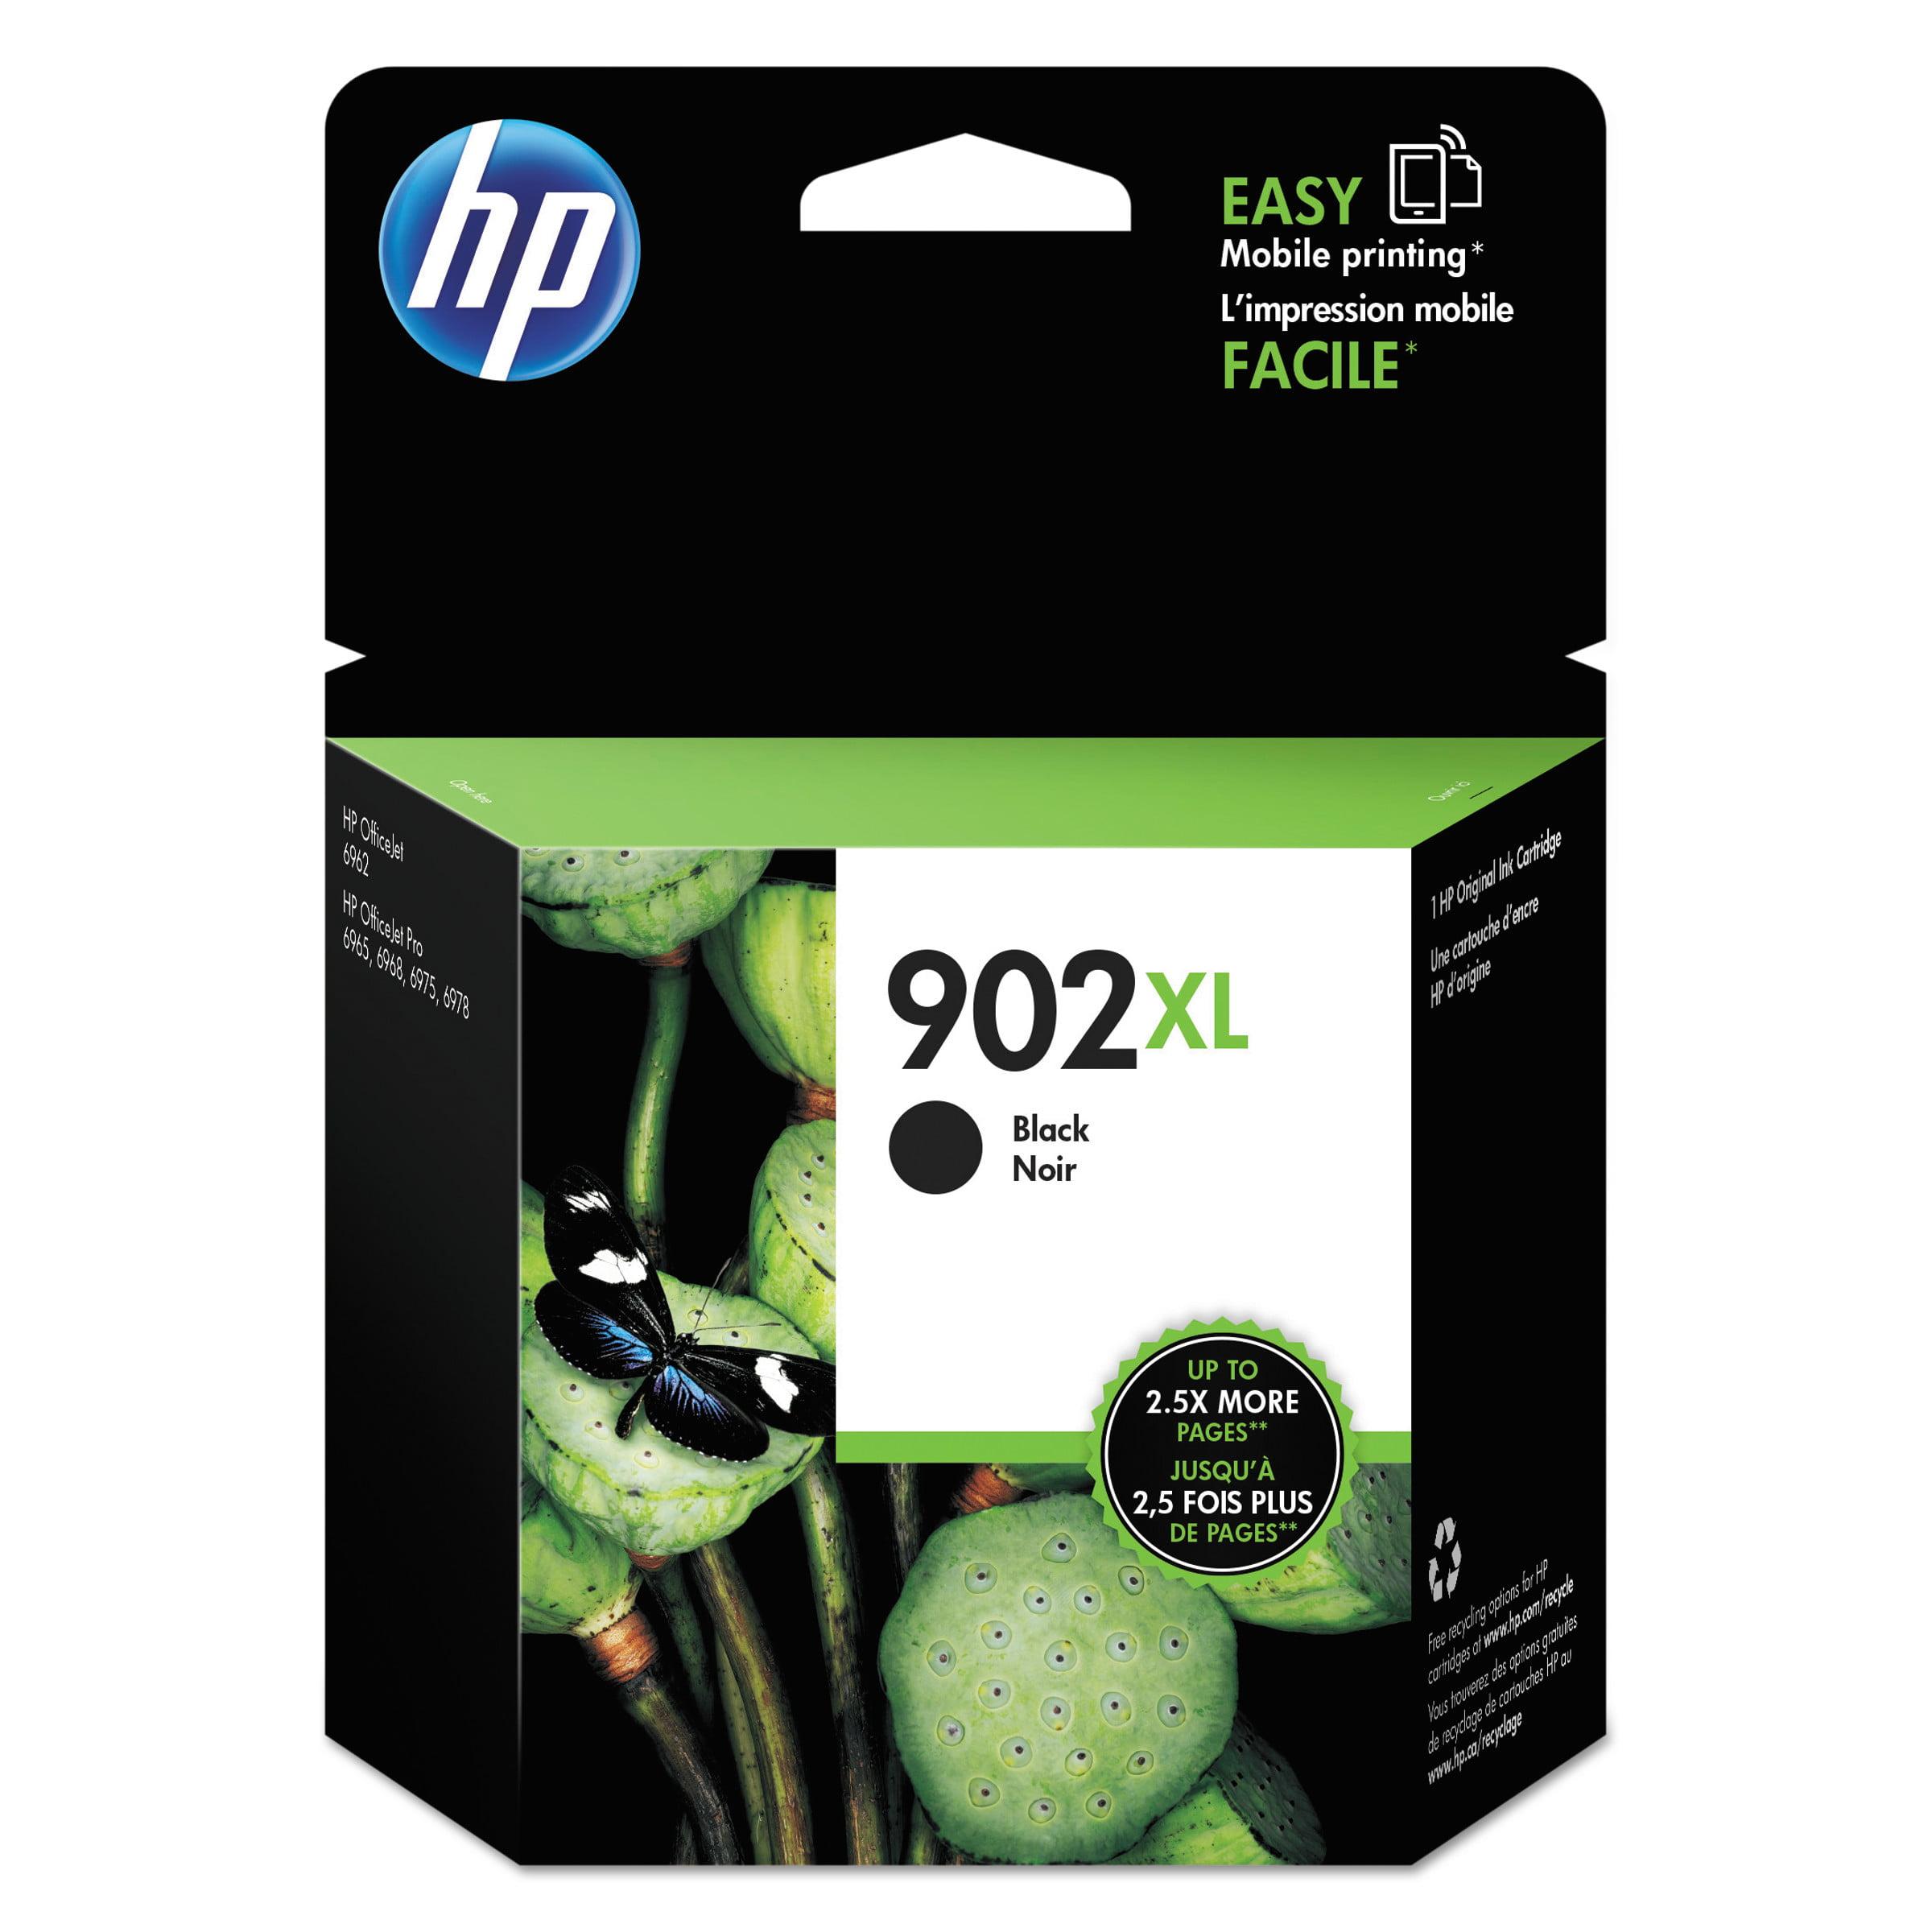 HP HP 902XL (T6M14AN) High-Yield Black Original Ink Cartridge by HP